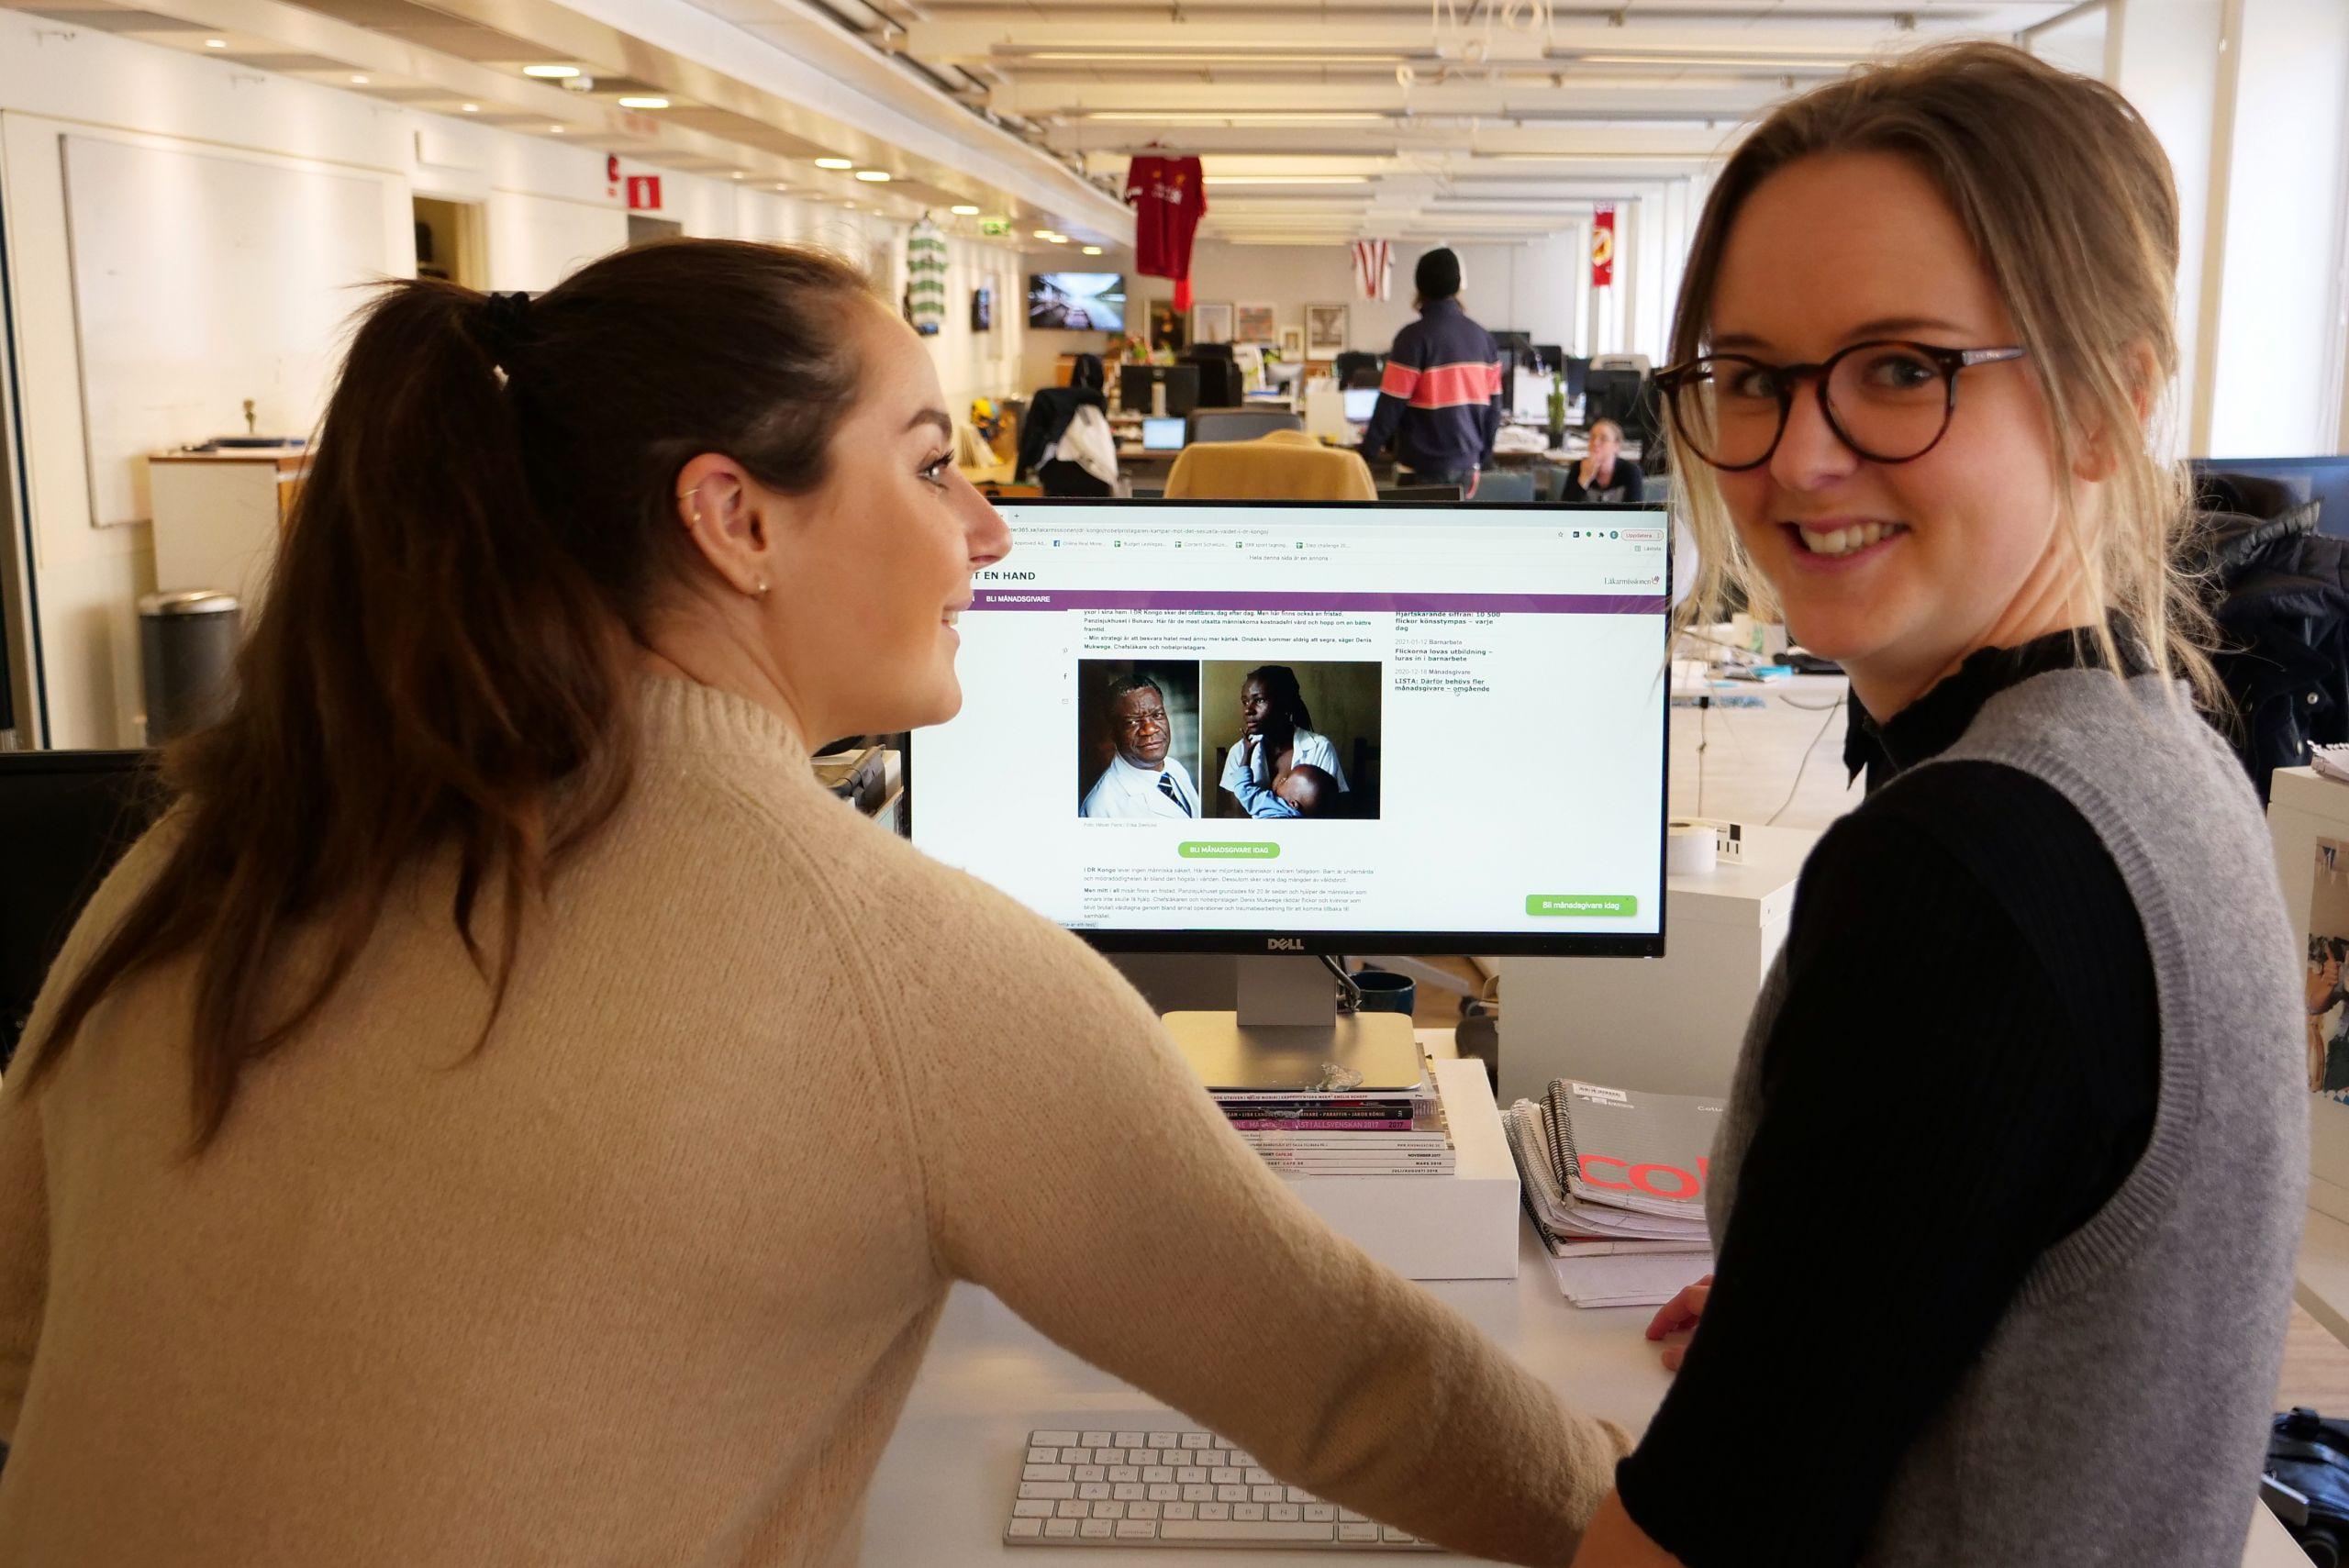 Sara Ohlsén, Client manager and Lydia Staf, editor for Läkarmissionen.